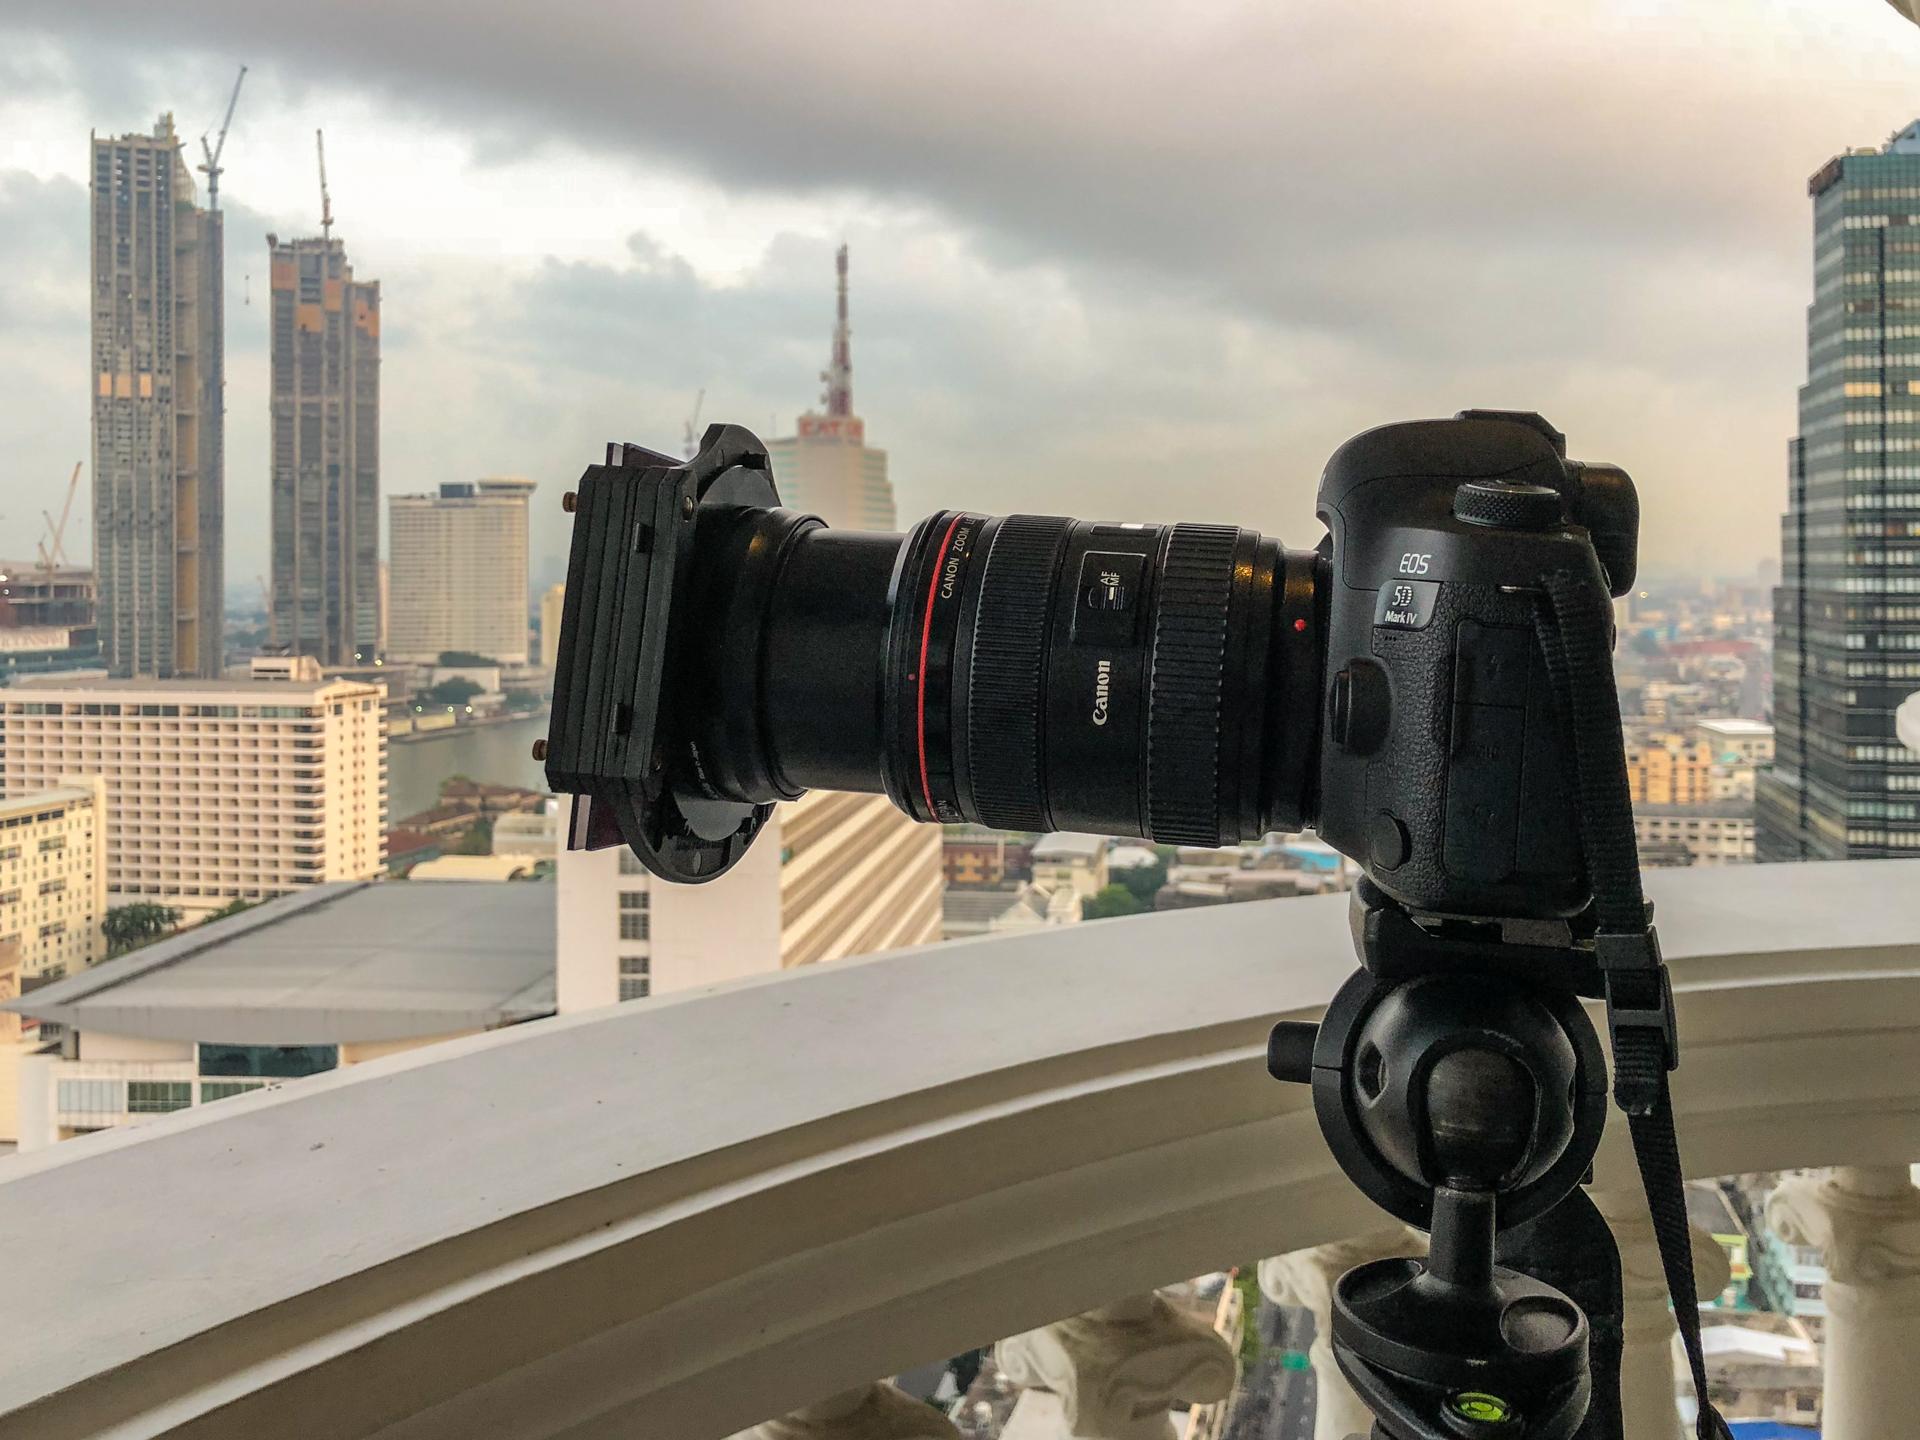 Photographing theBangkok skyline from a hotel balcony.